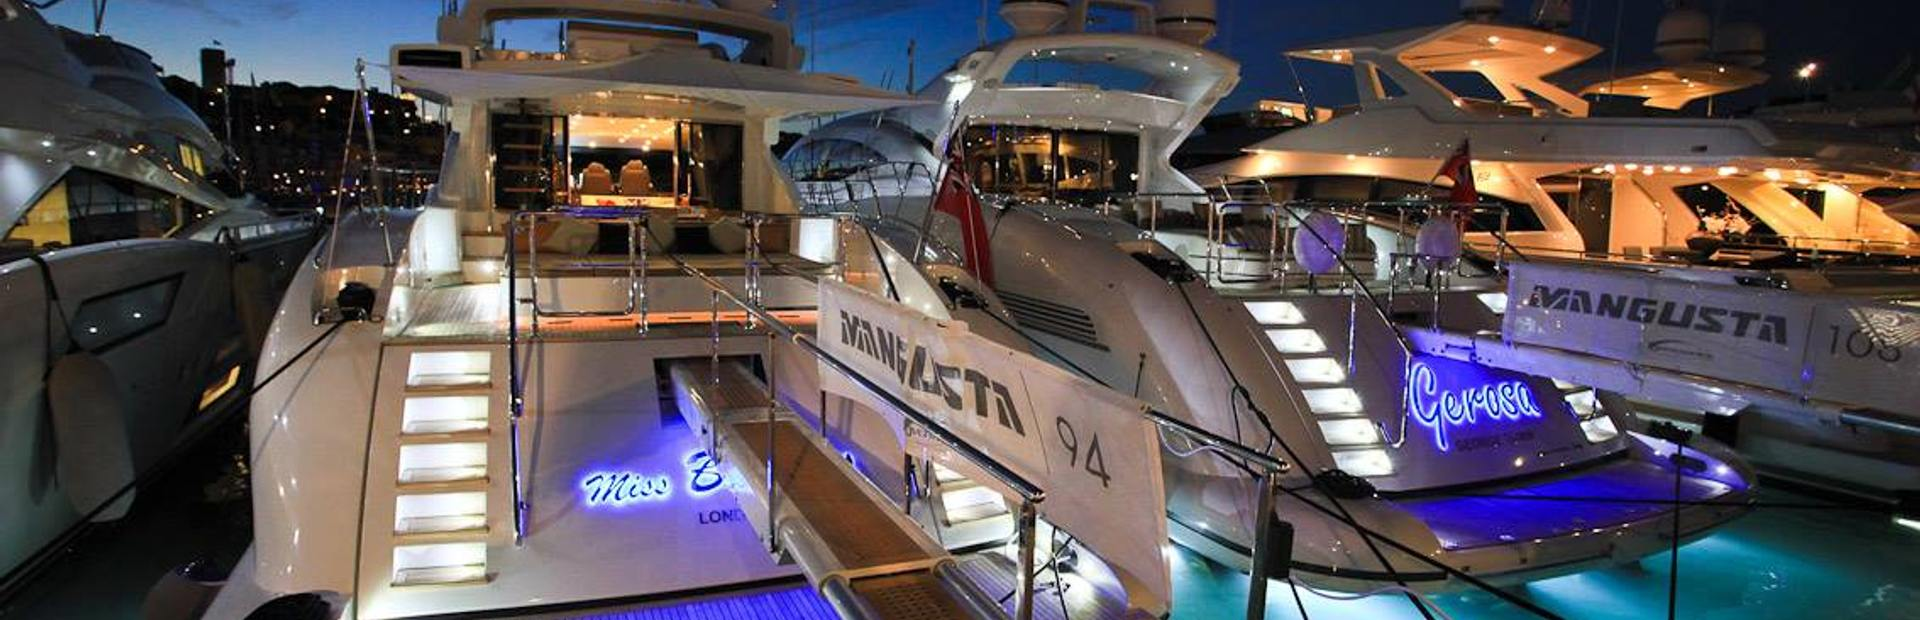 Mangusta Yachts at night Monaco Yacht Show